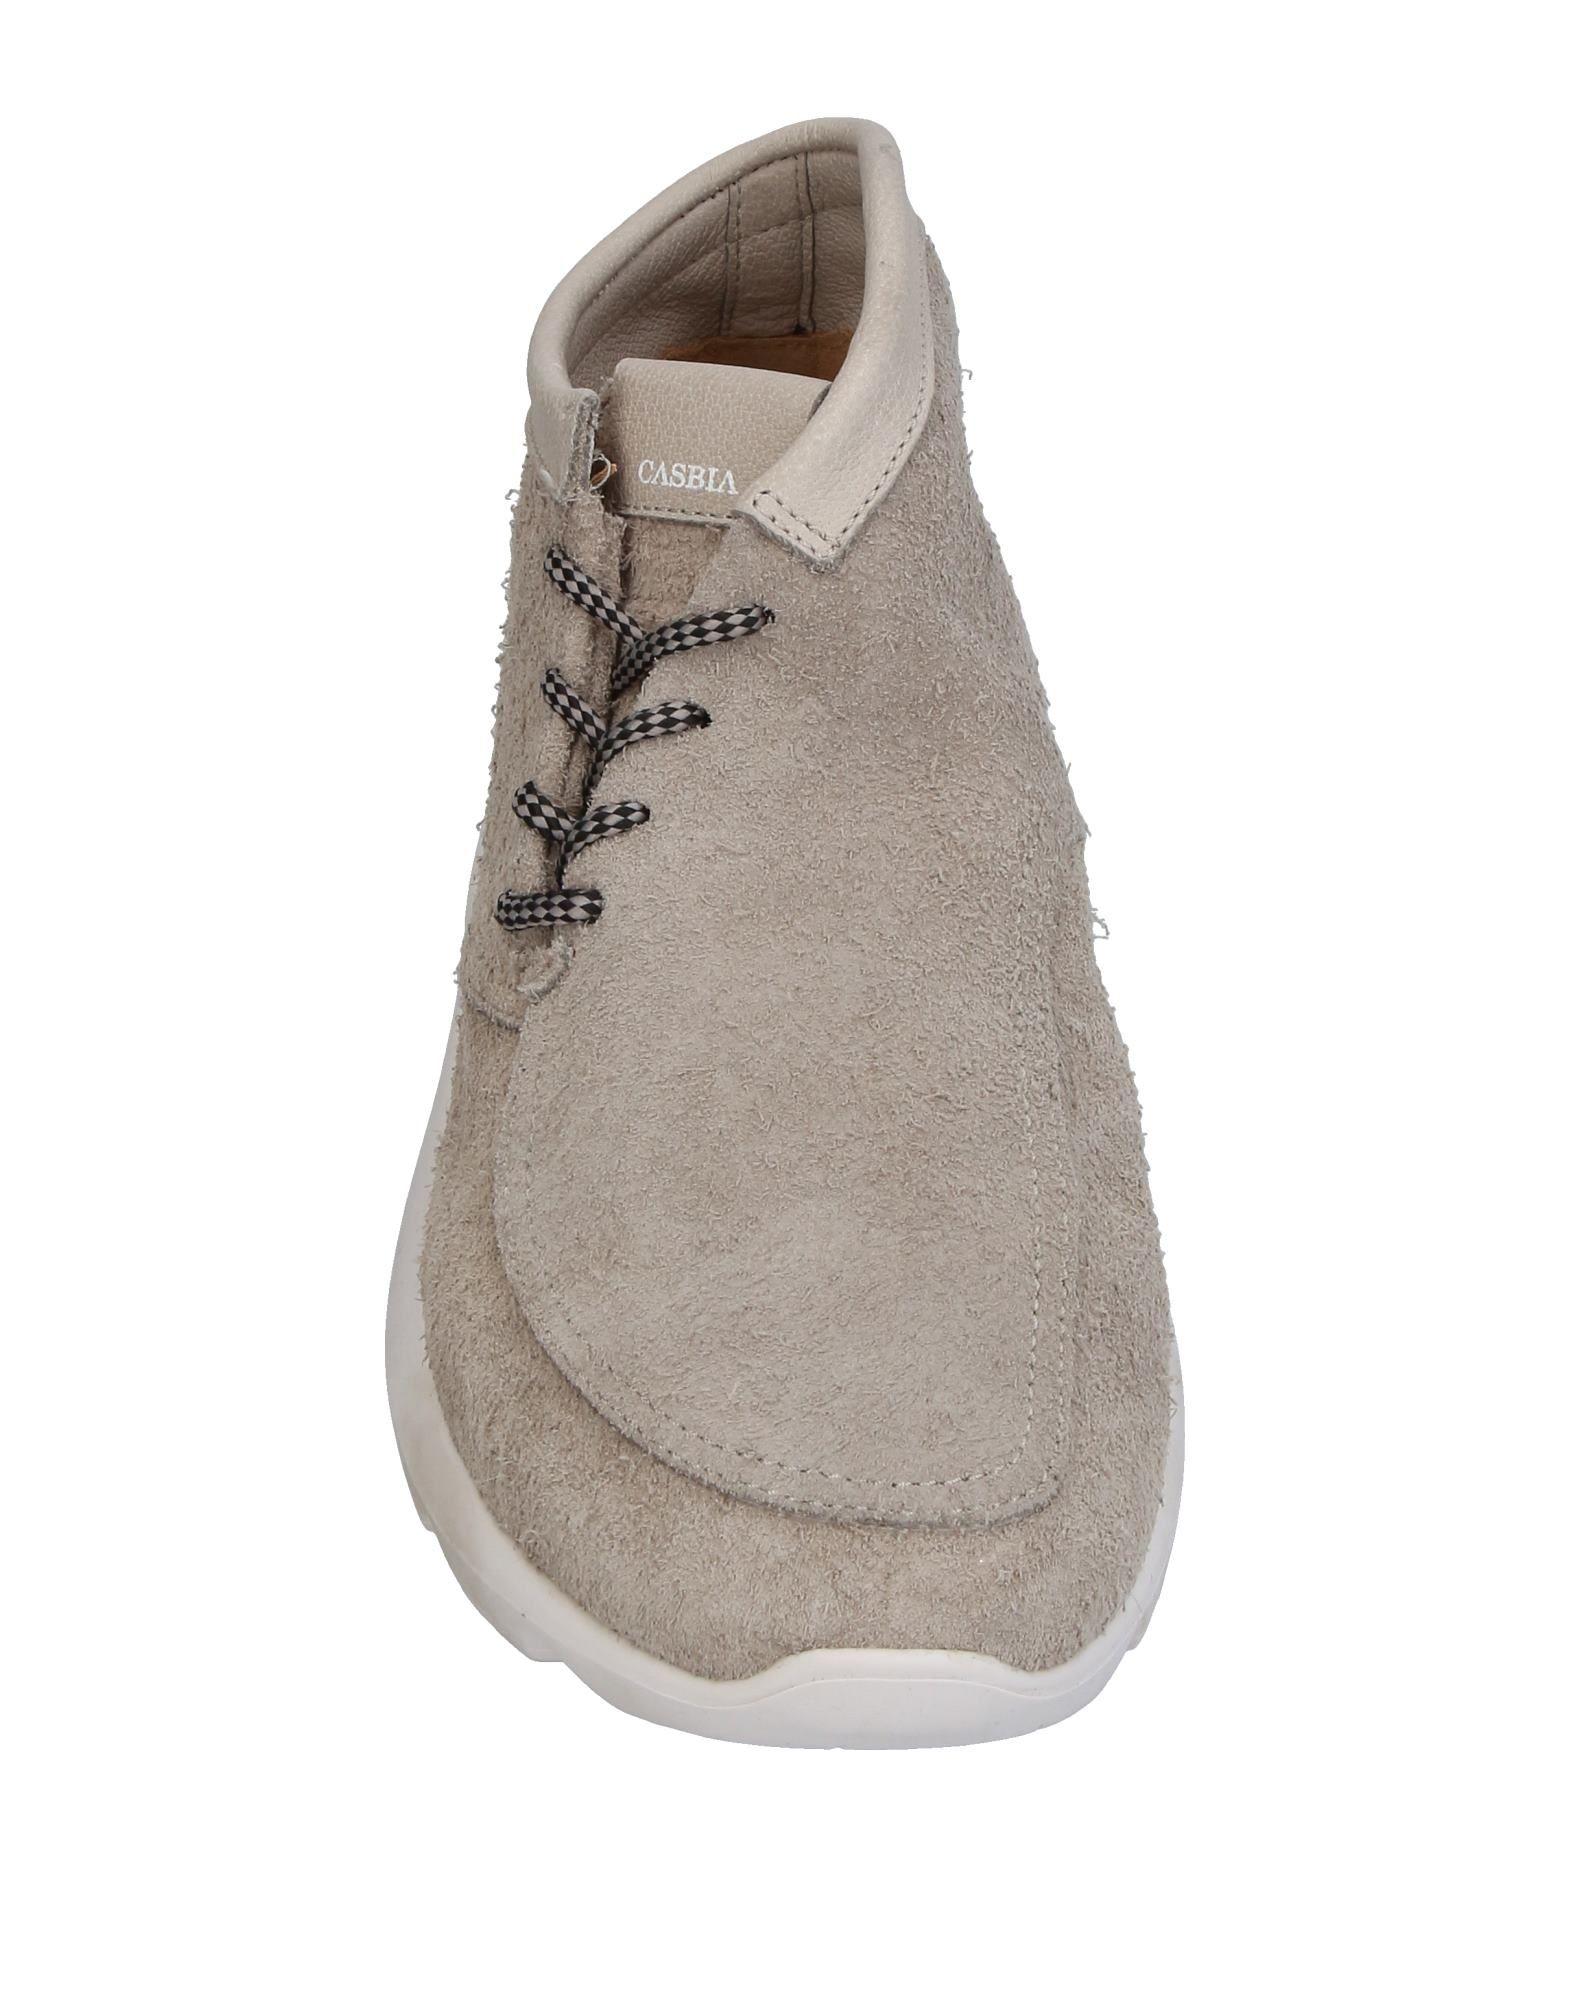 Casbia Heiße Sneakers Herren  11406761RH Heiße Casbia Schuhe f9db04